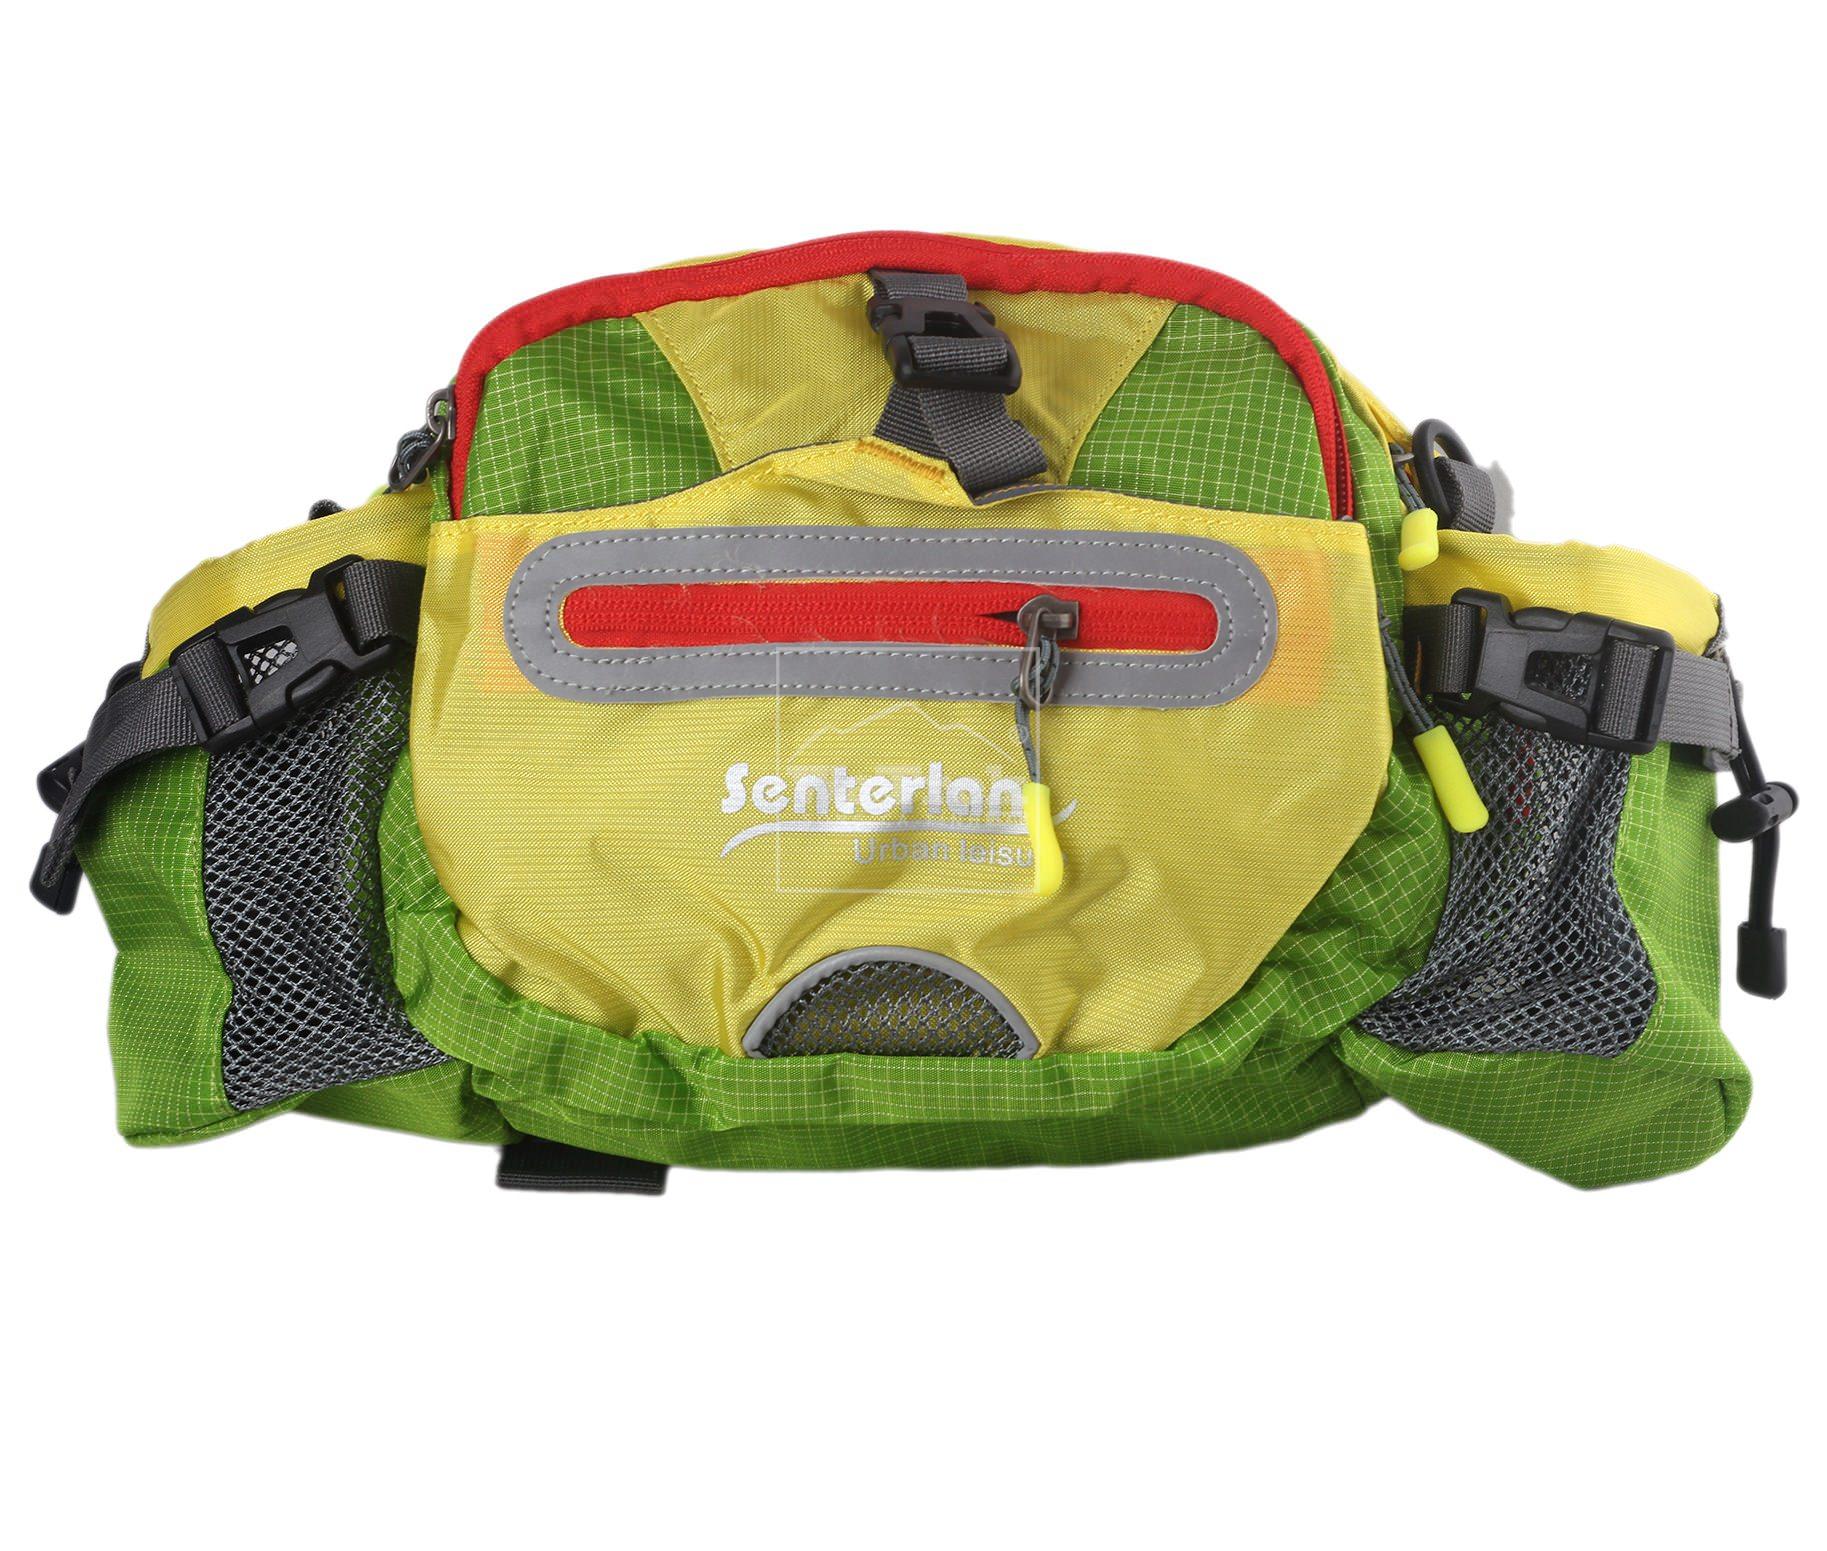 Túi đeo bụng Senterlan Urban Leisure S2520 - 5590 Xanh lá